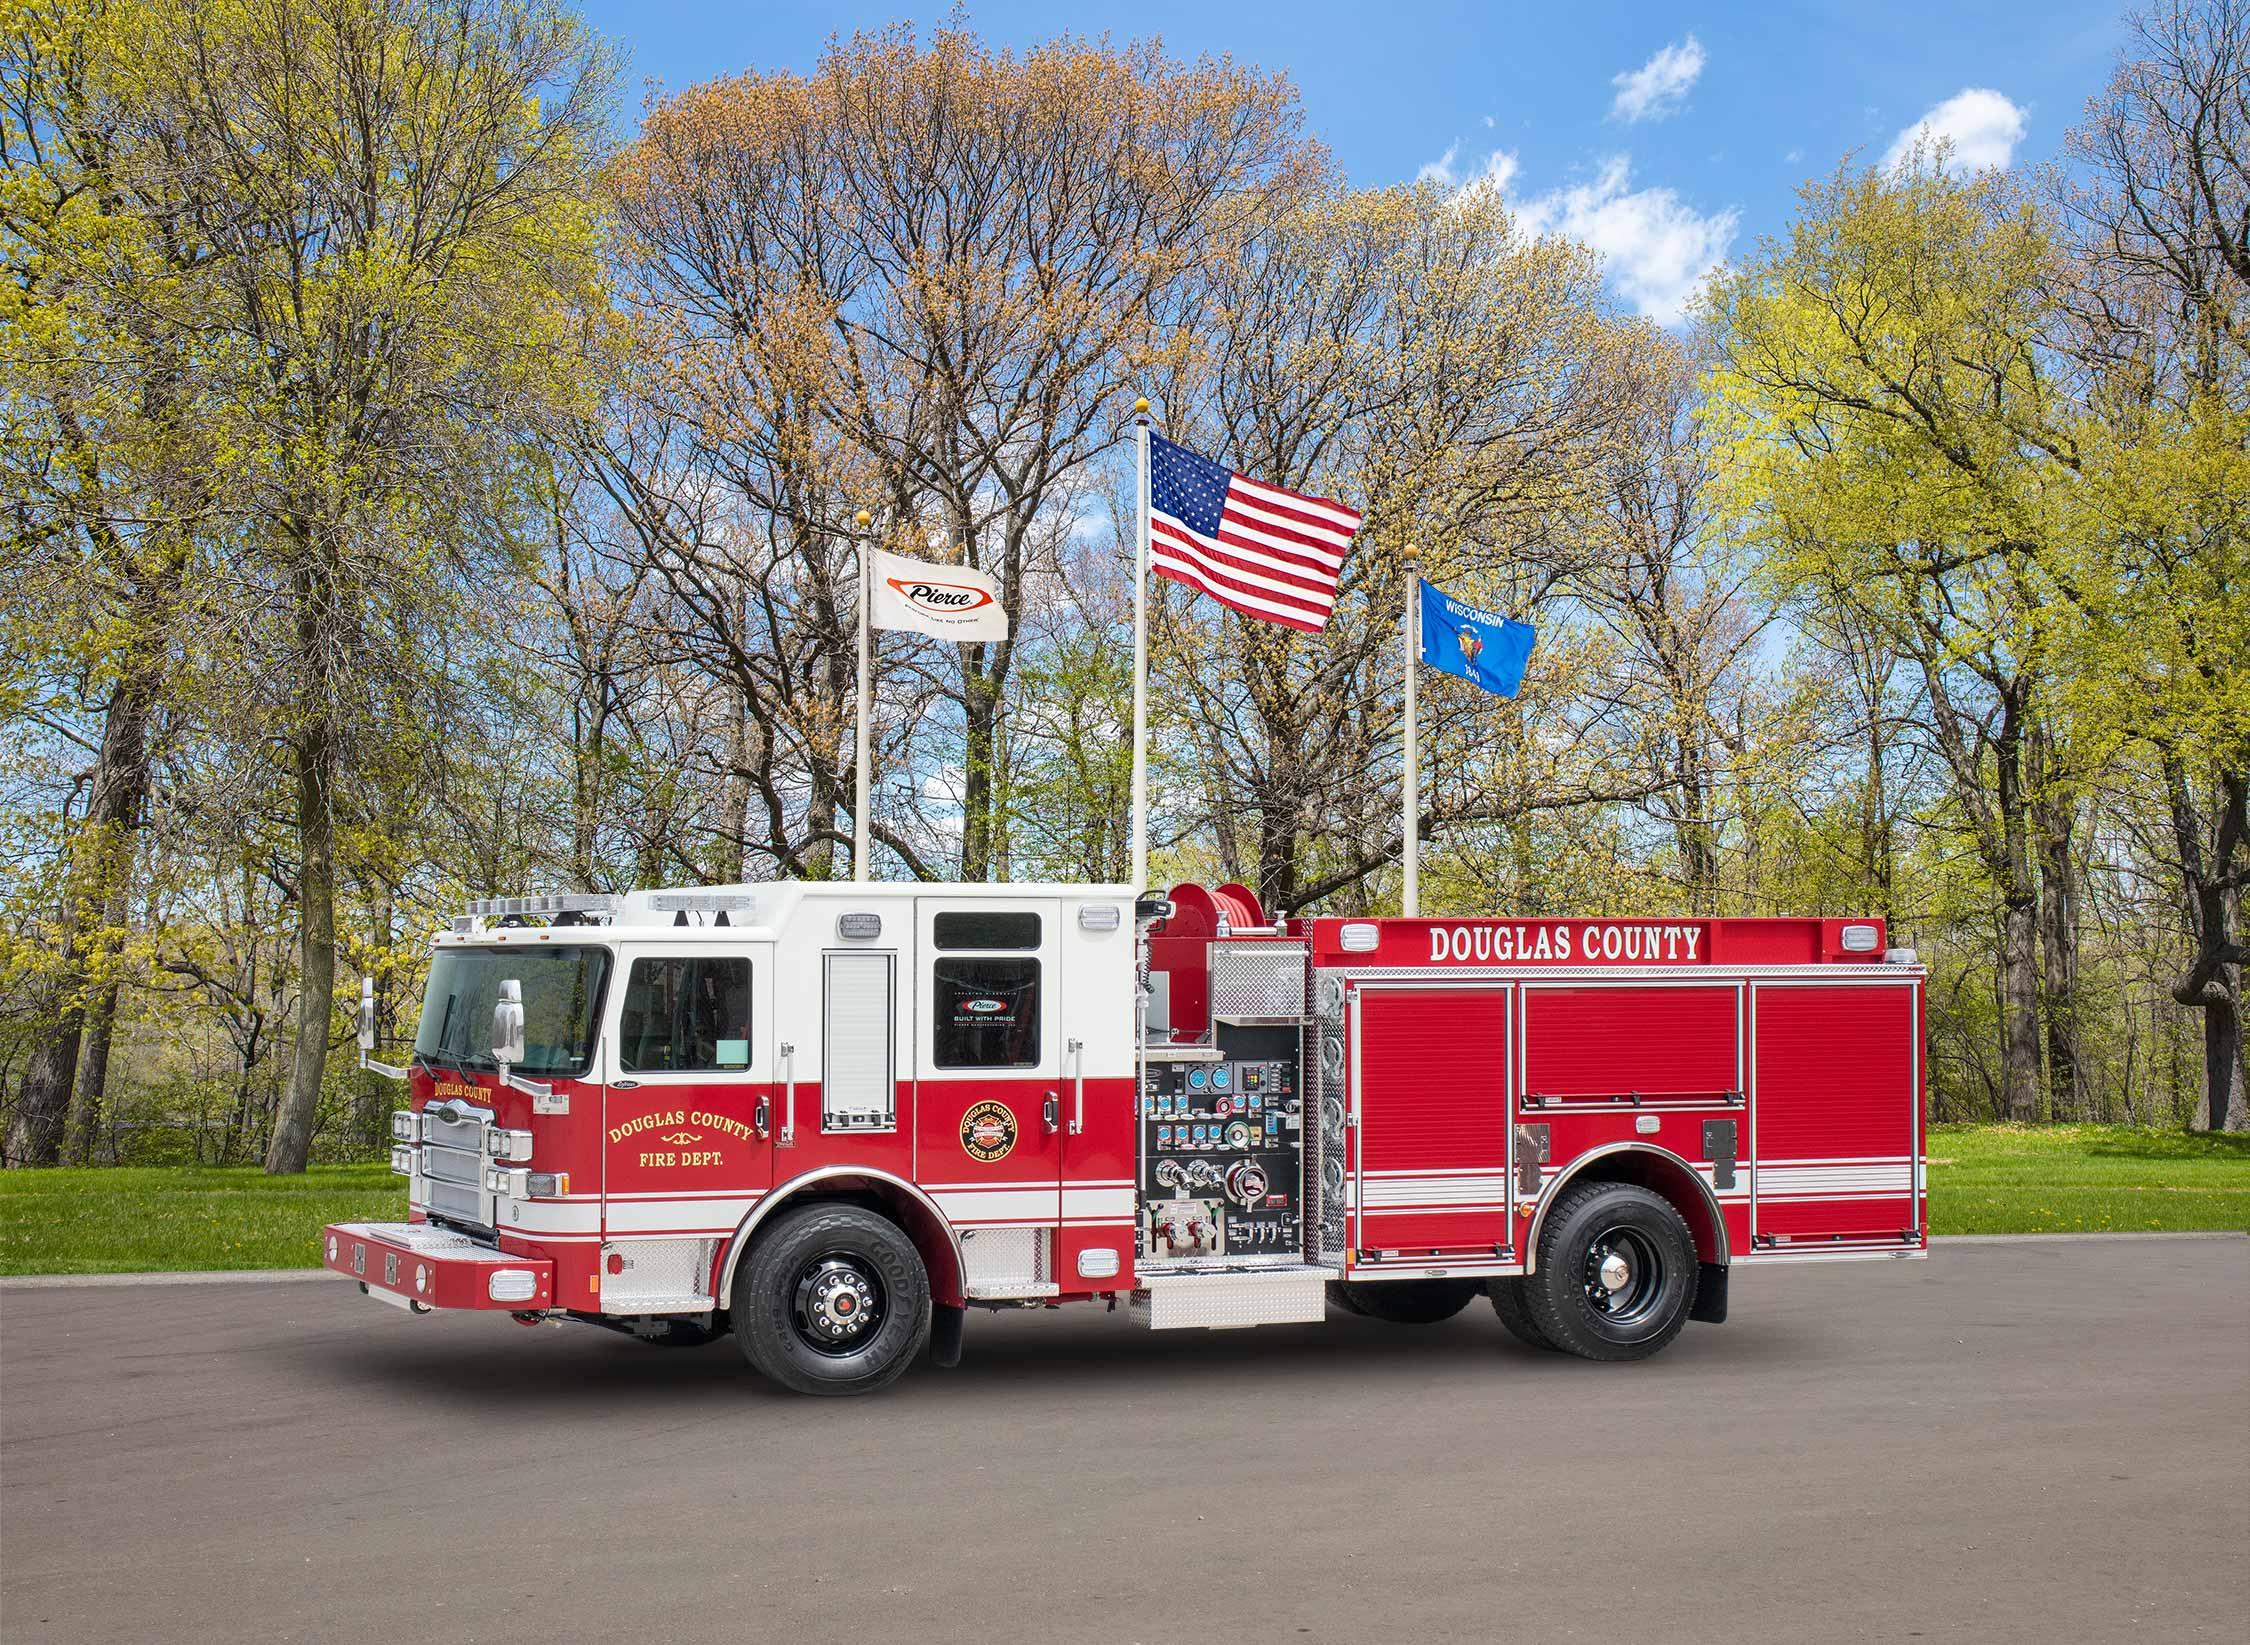 Douglas County Fire Department - Pumper